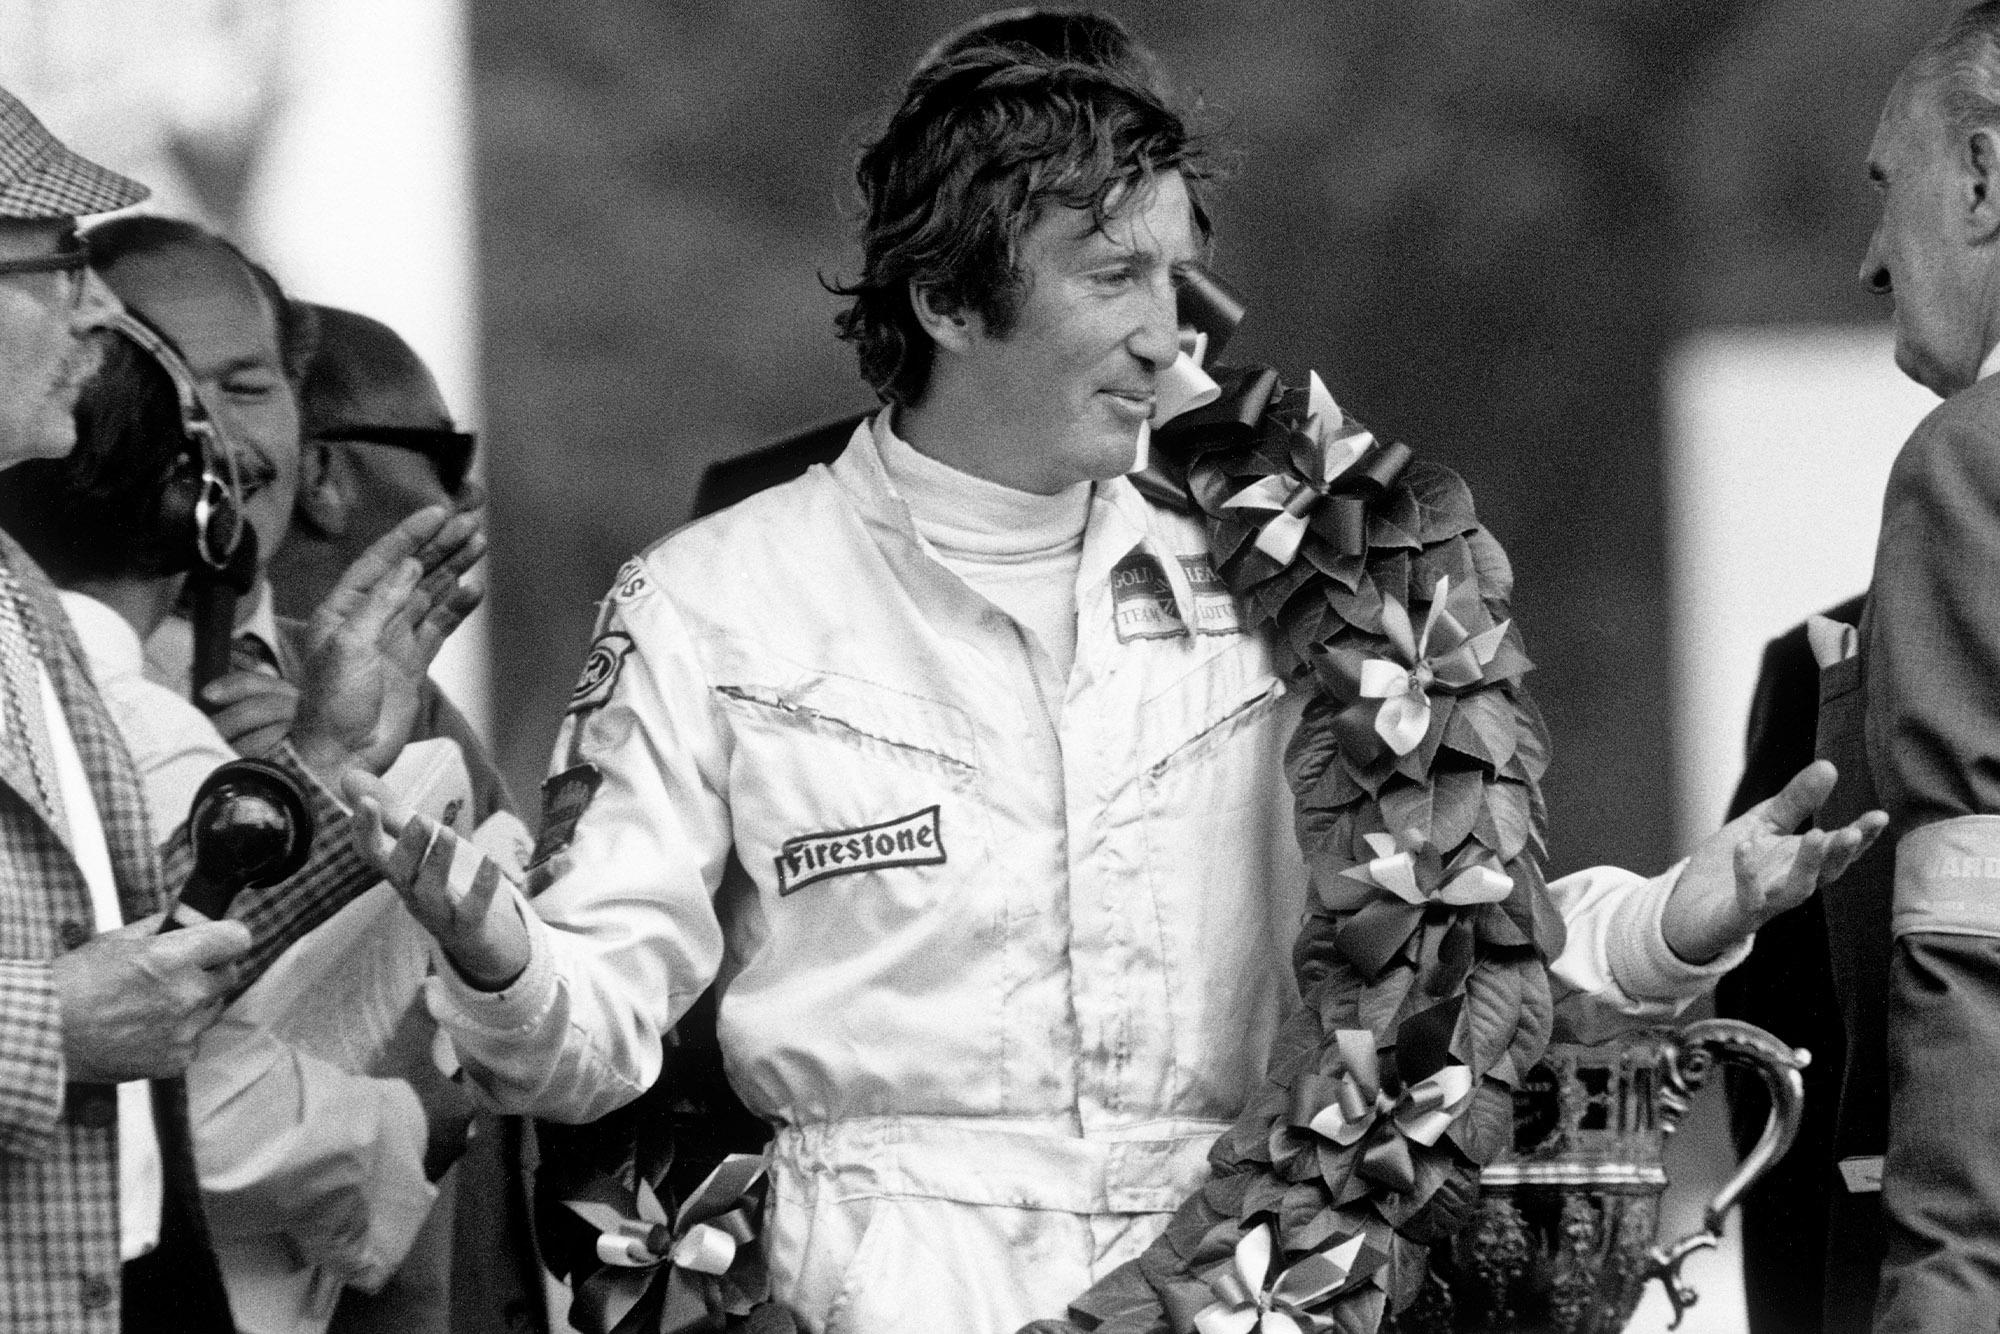 Jochen Rindt on the podium at the 1970 British Grand Prix